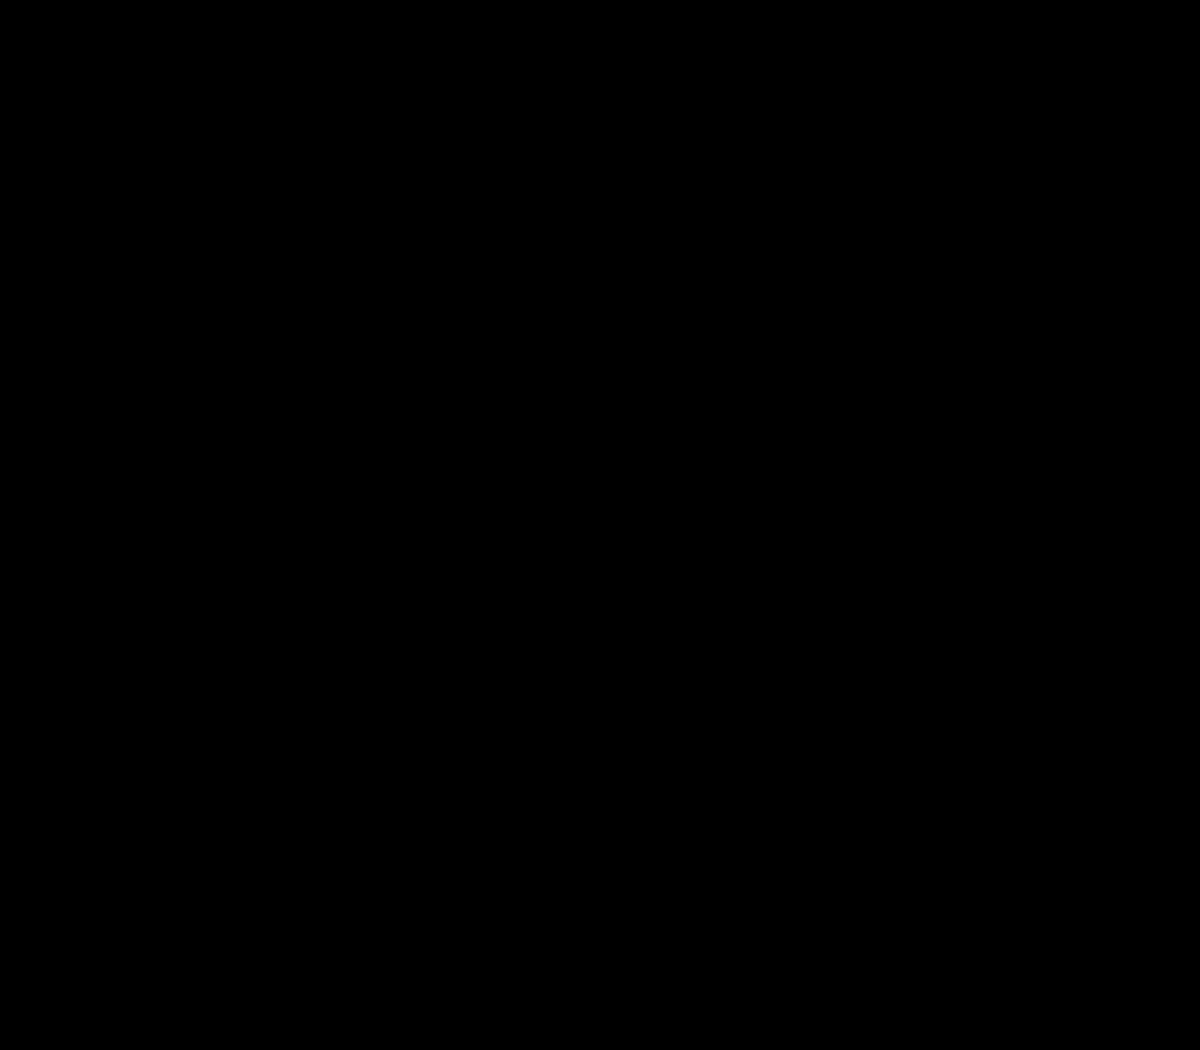 1200x1050 Thales's Theorem